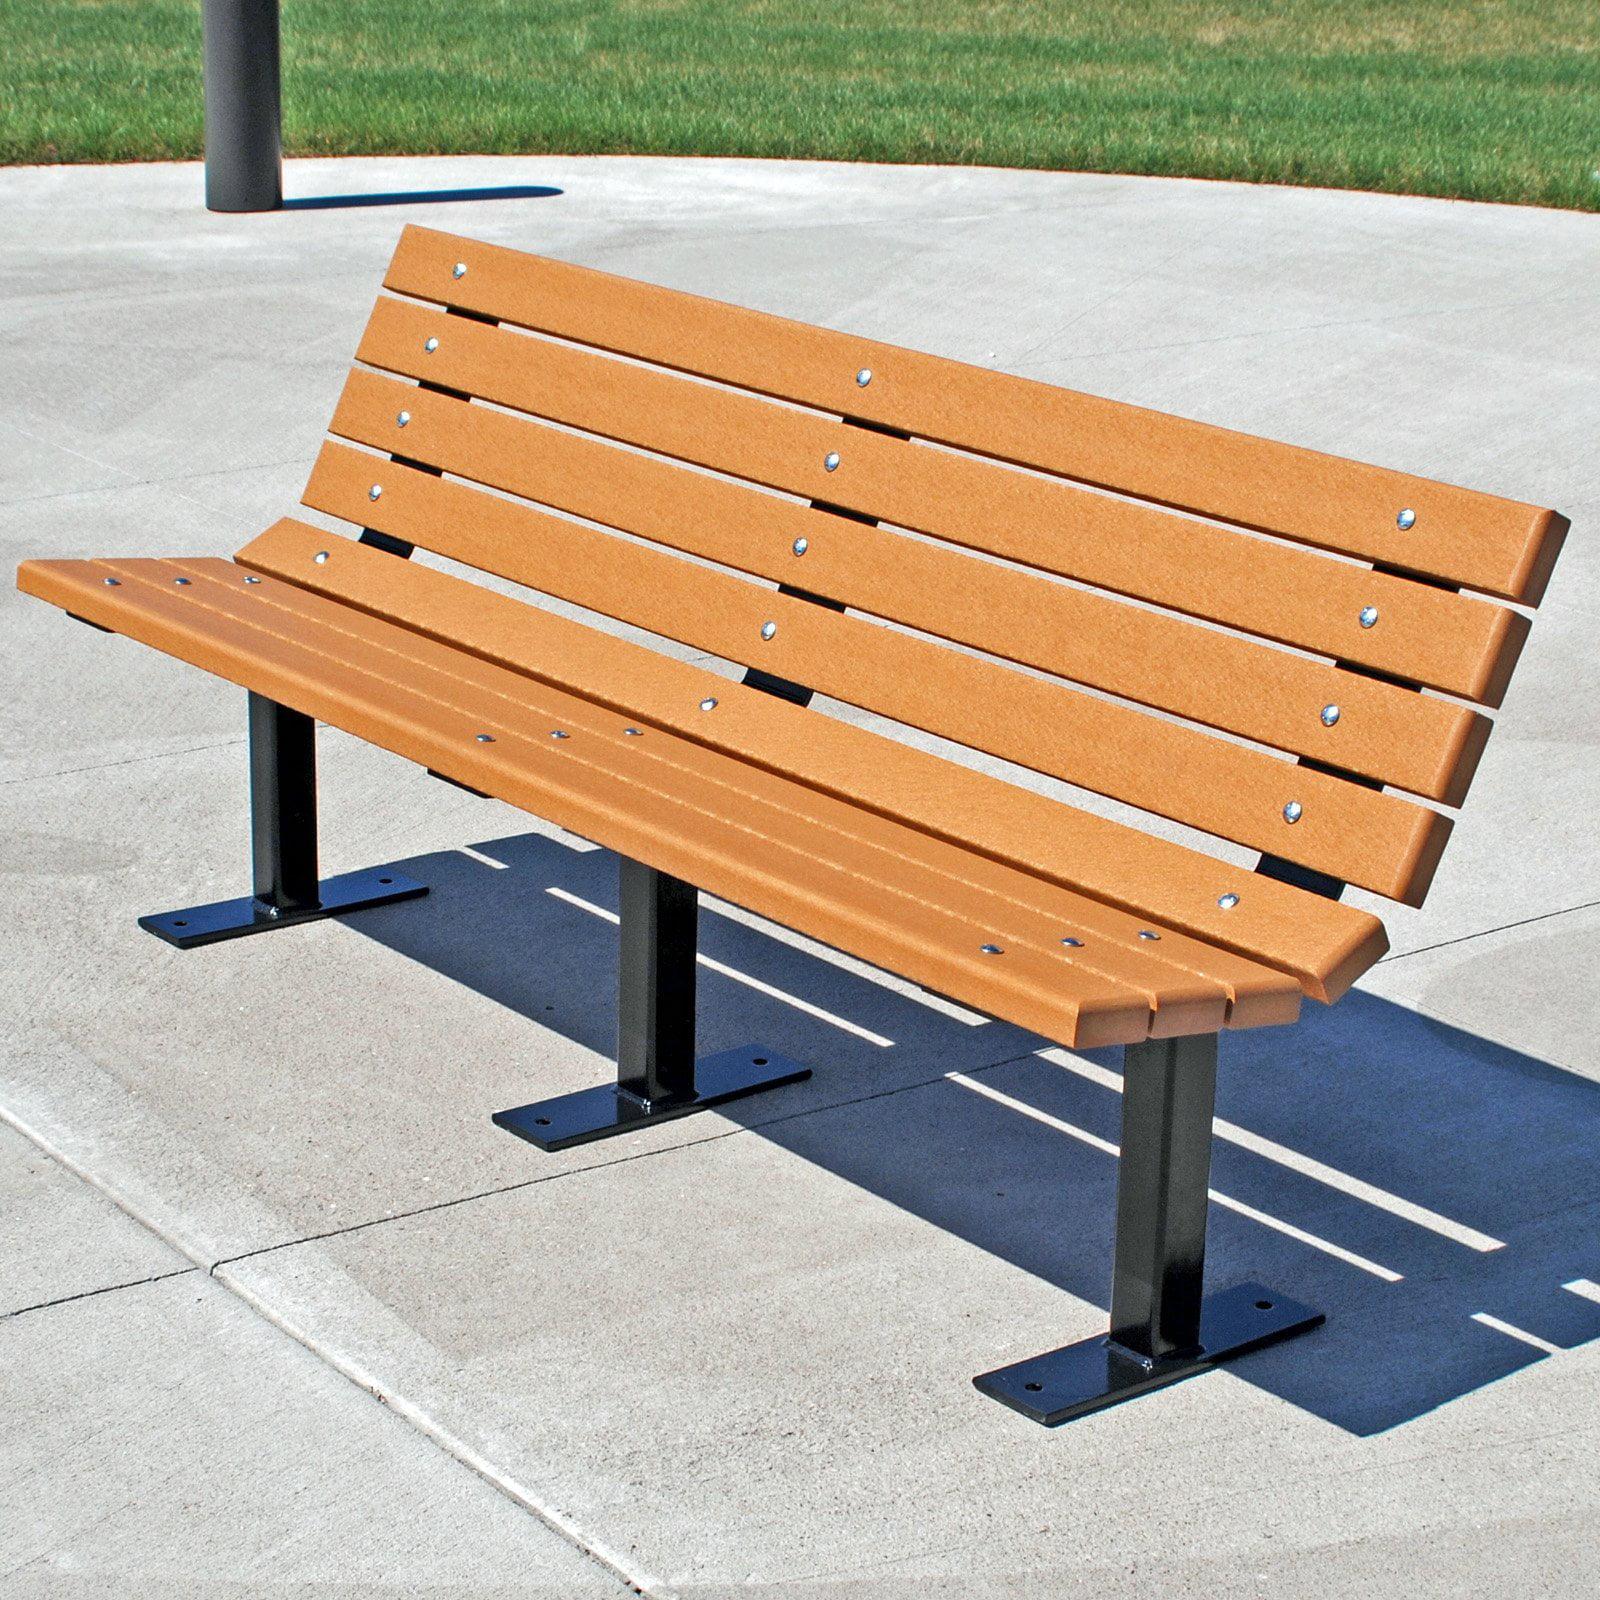 Jayhawk Plastics Contour Park Bench 6 ft. White Ground Mount by Jayhawk Plastics Inc